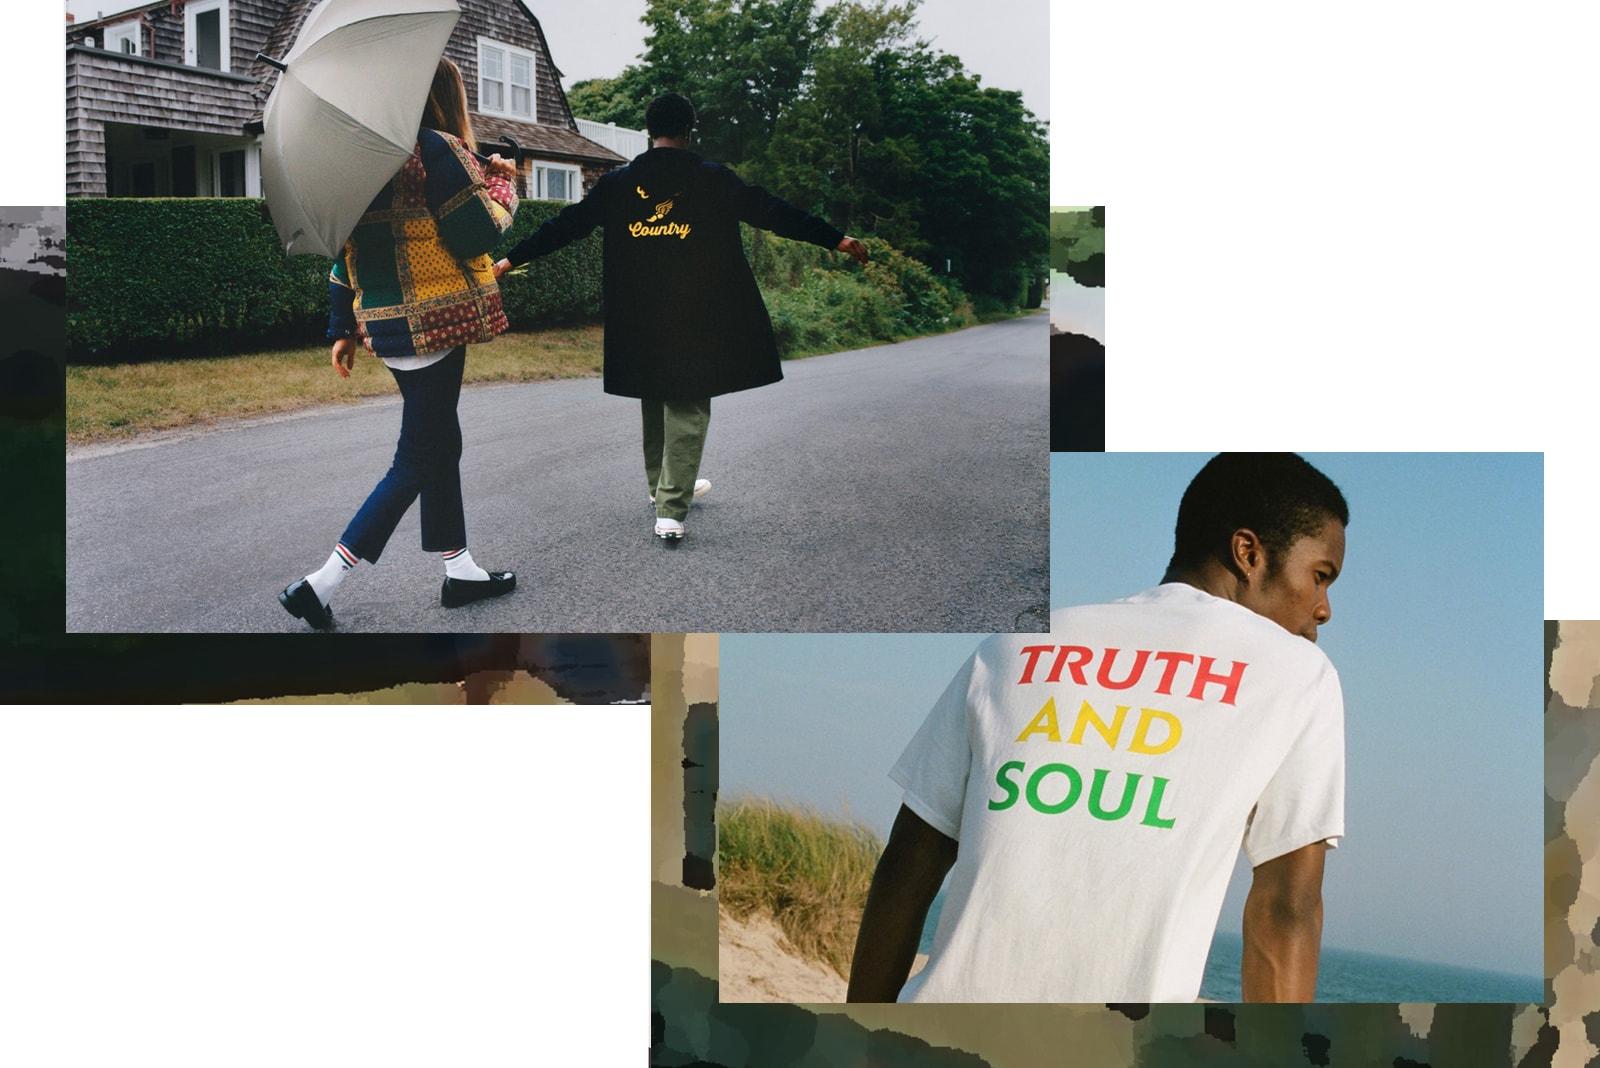 top best fashion brand designers stussy rick owens noah nyc nike supreme louis vuitton virgil abloh kapital needles the north face